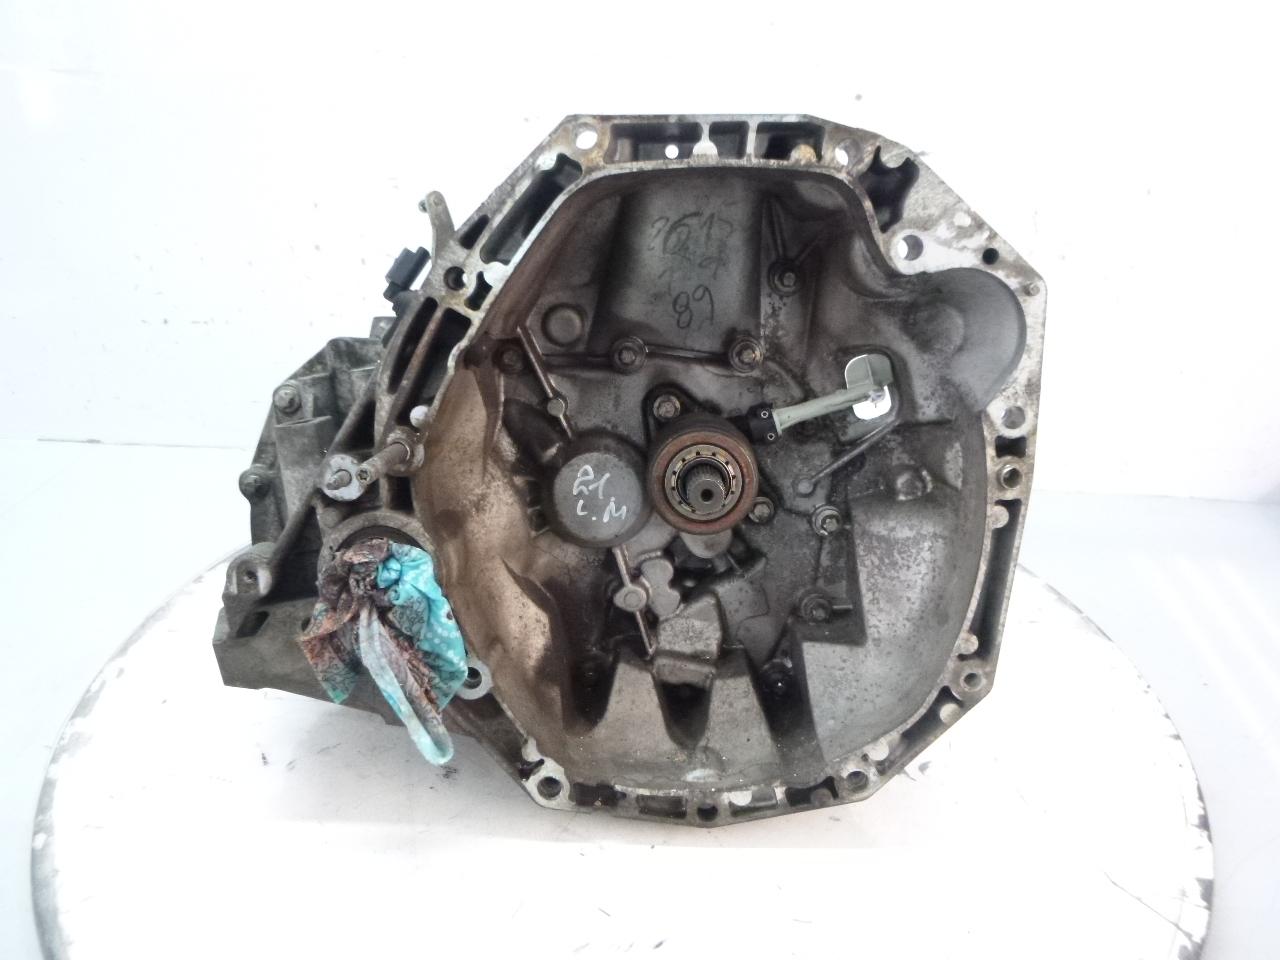 Getriebe Schaltgetriebe Renault Kangoo K9K K9K800 CEDJRGF 8200977061 DE249362